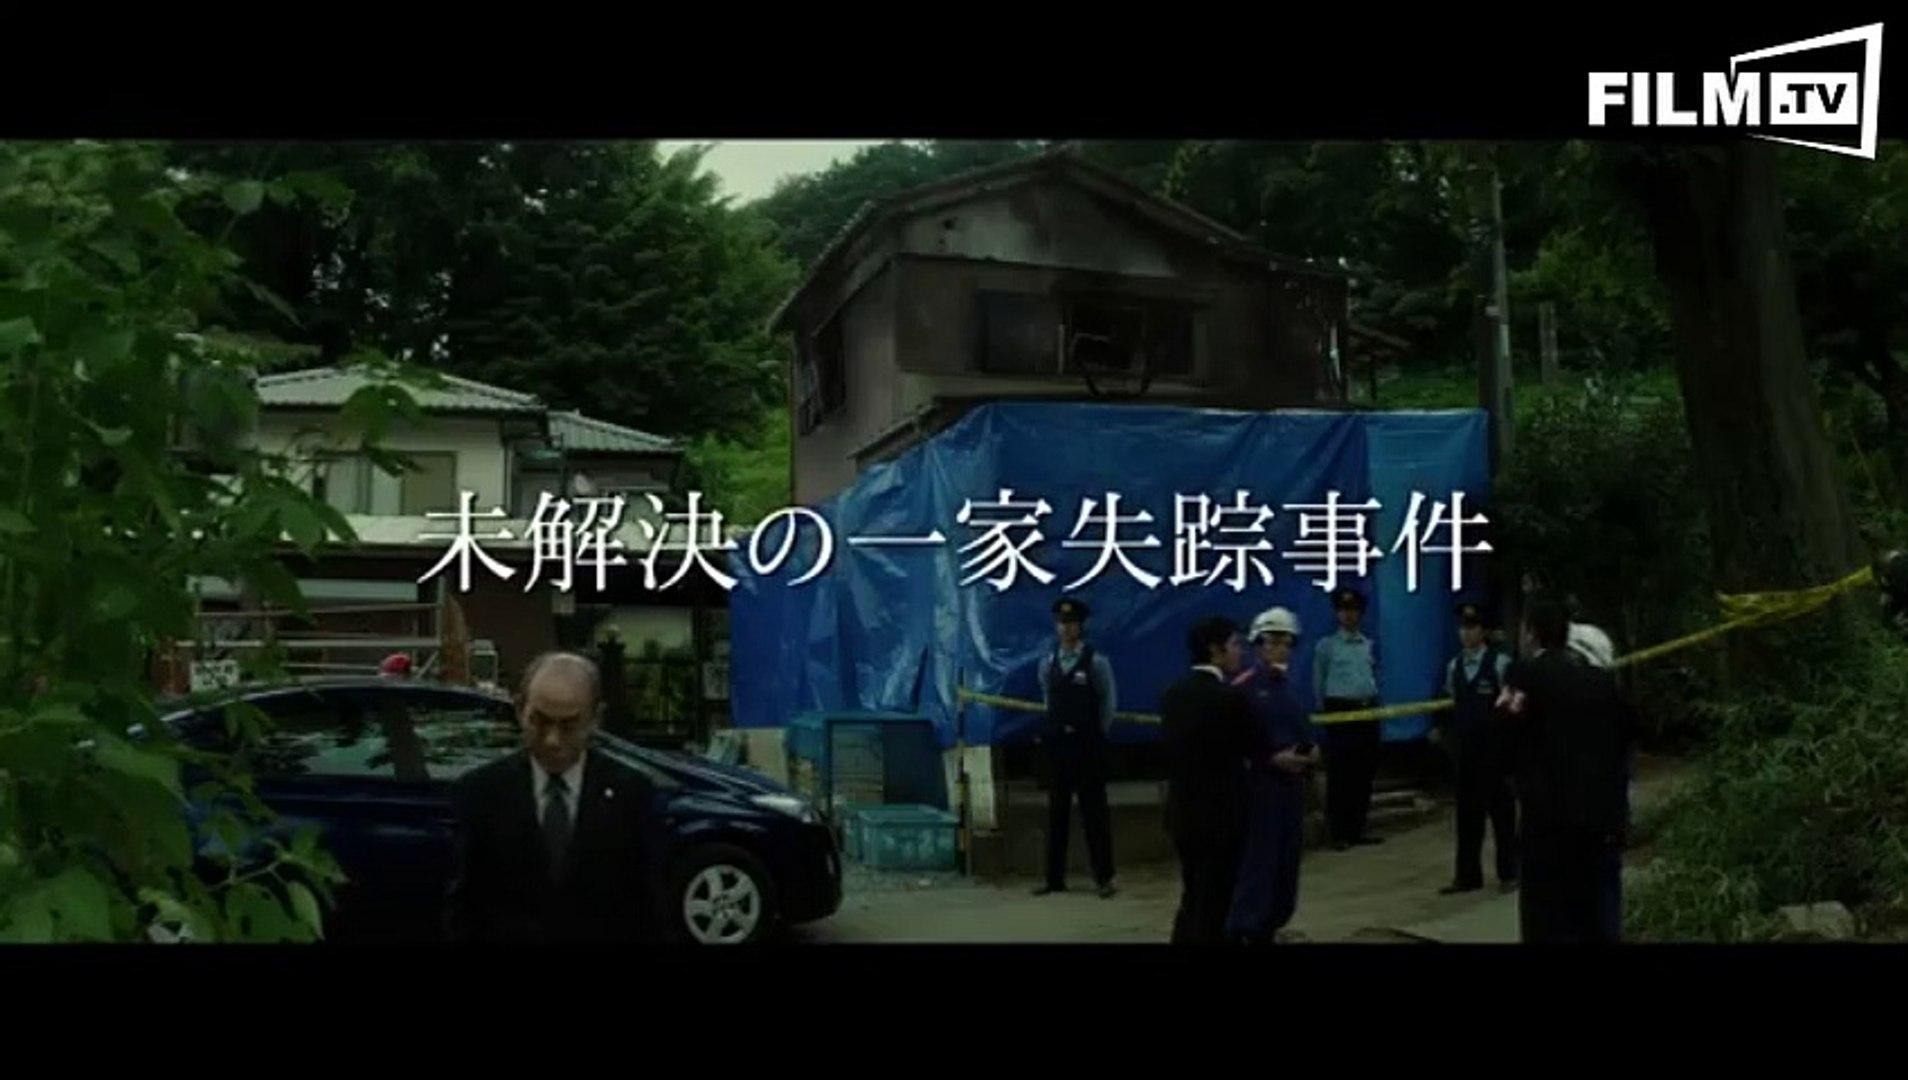 Creepy - Trailer - Filmkritik (2016) - Trailer